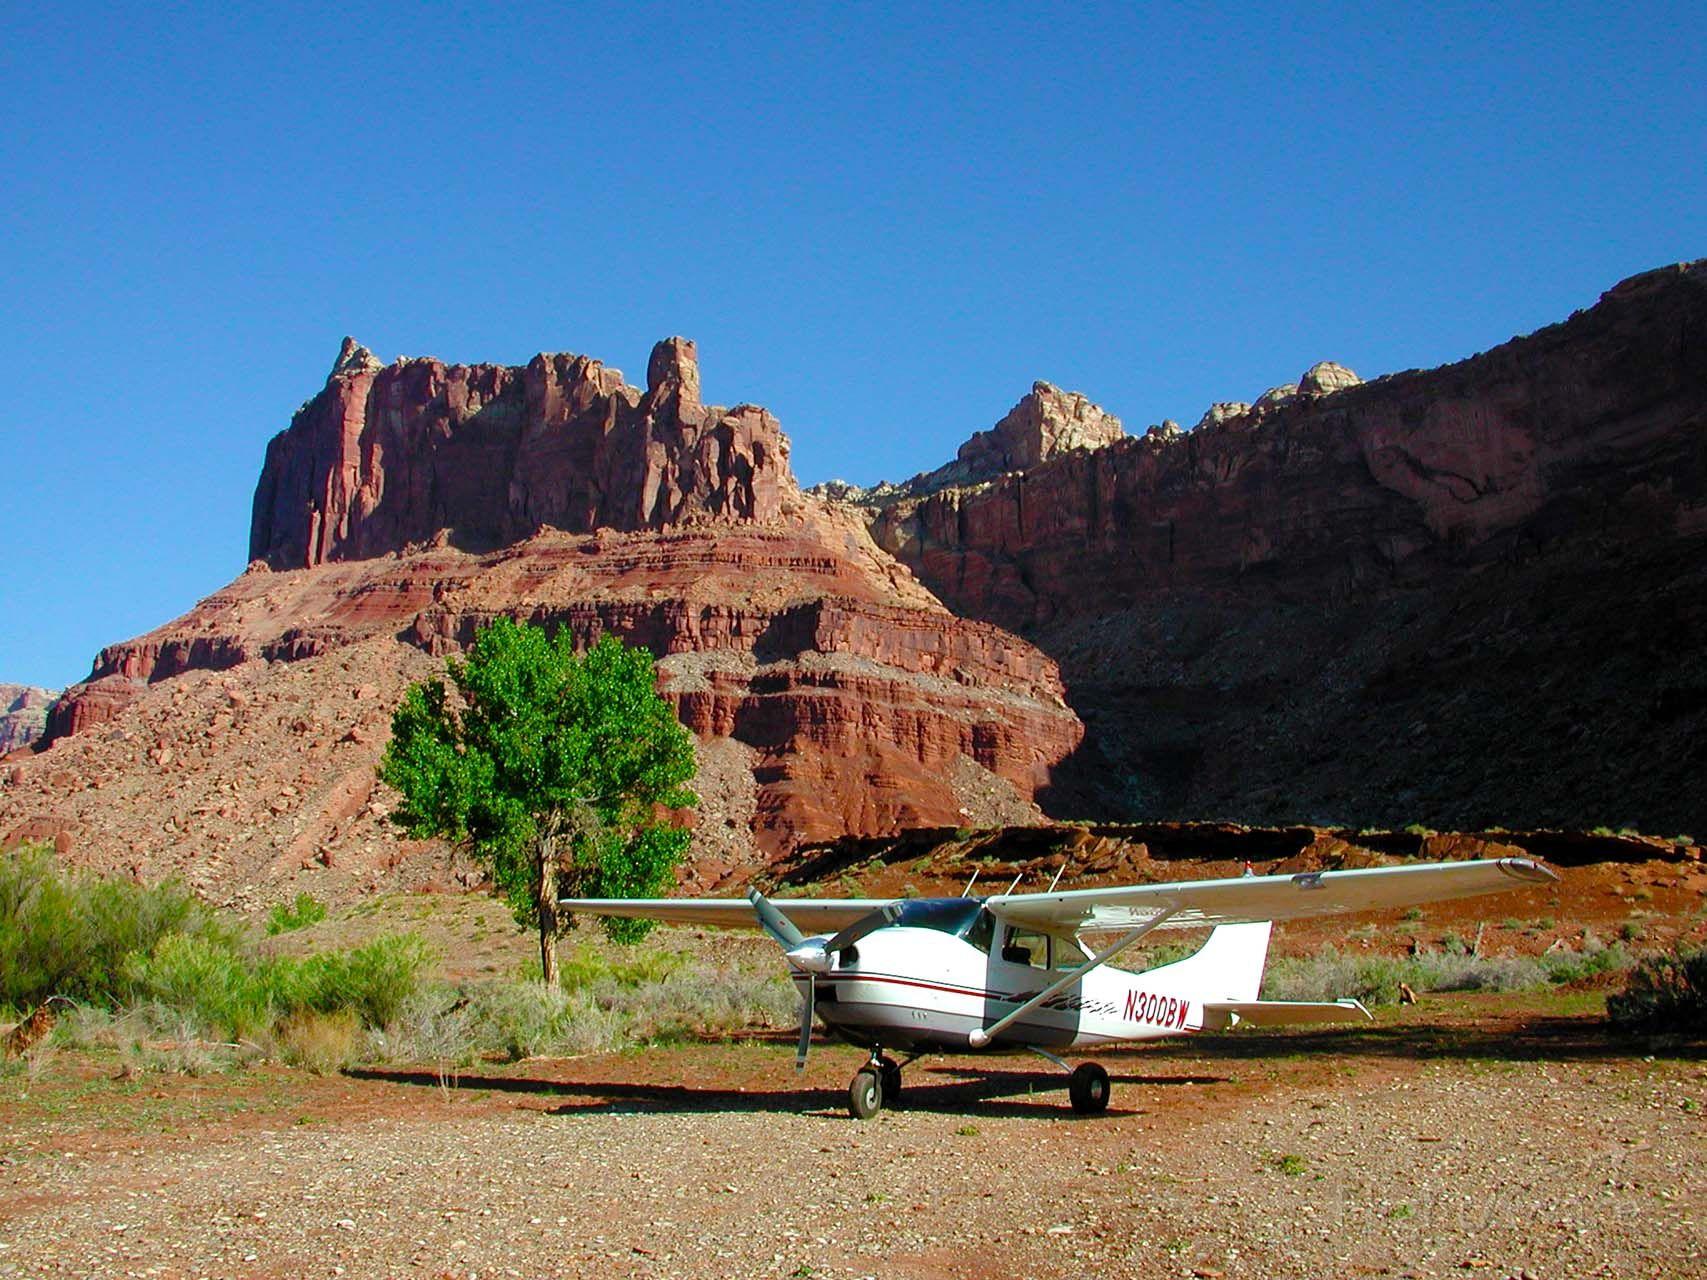 Cessna Skylane (N300BW) - Mexican Mountain Airstrip, Utah